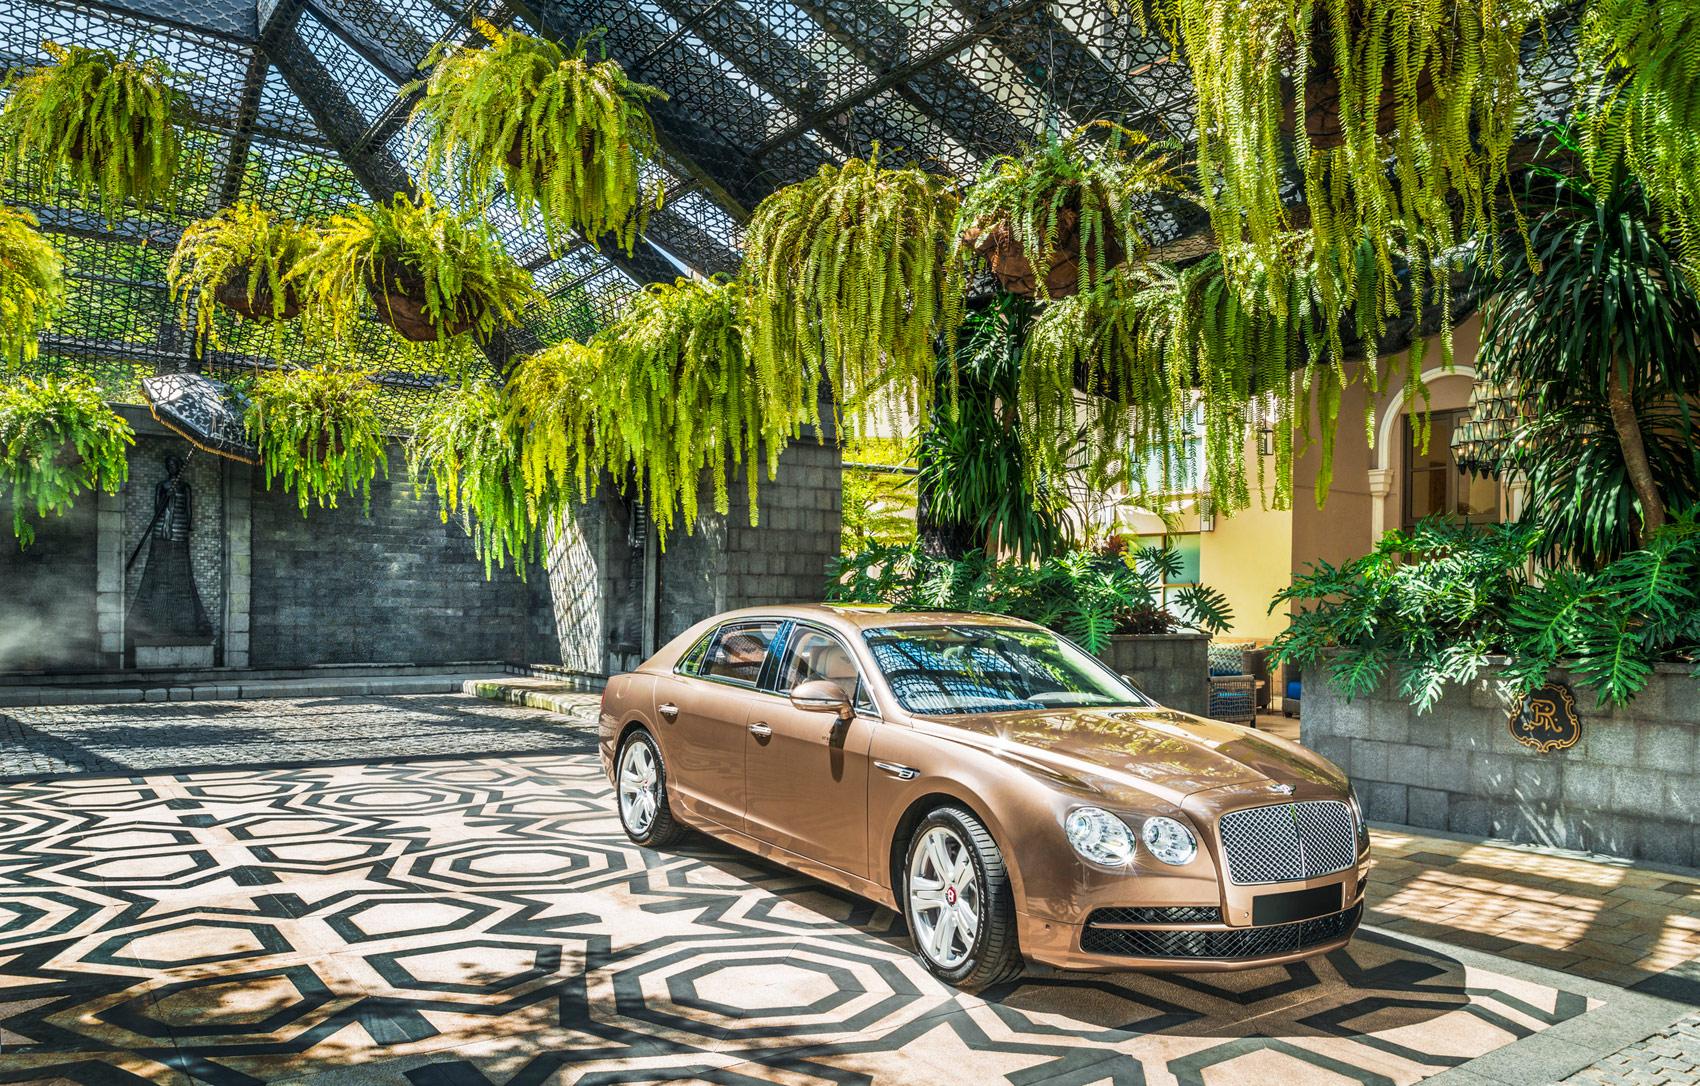 We Embark On The St. Regis Straits Drive With Bentley Motors & Princess Yachts 7